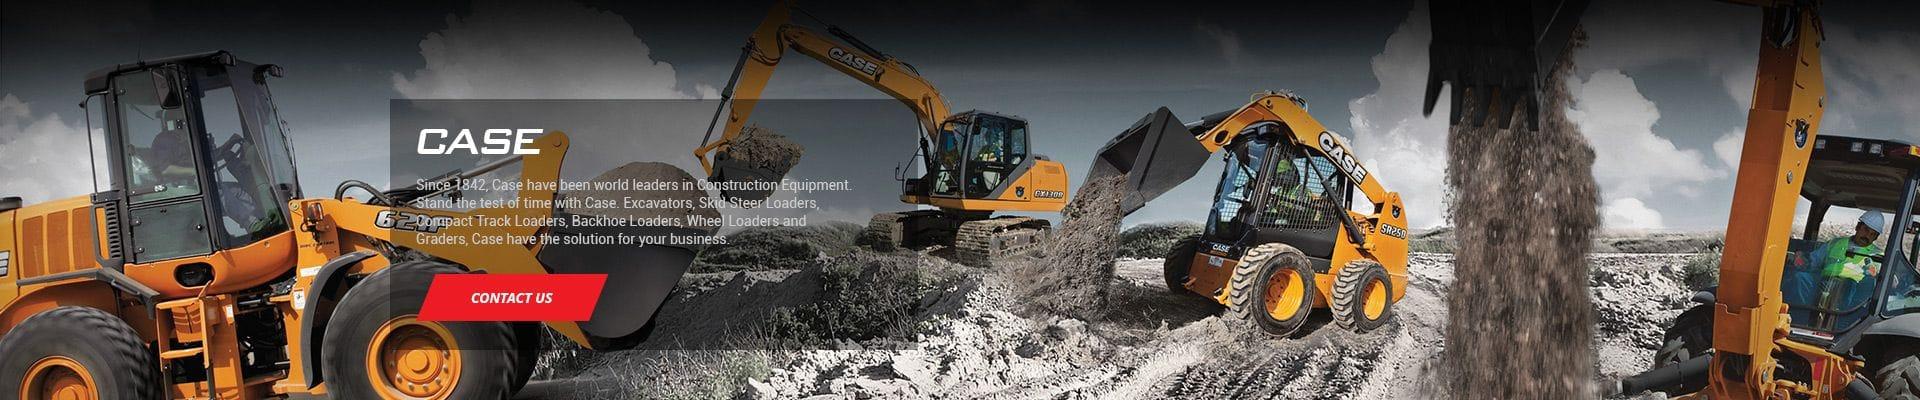 Construction & Excavation Machinery for Sale Australia | EEA